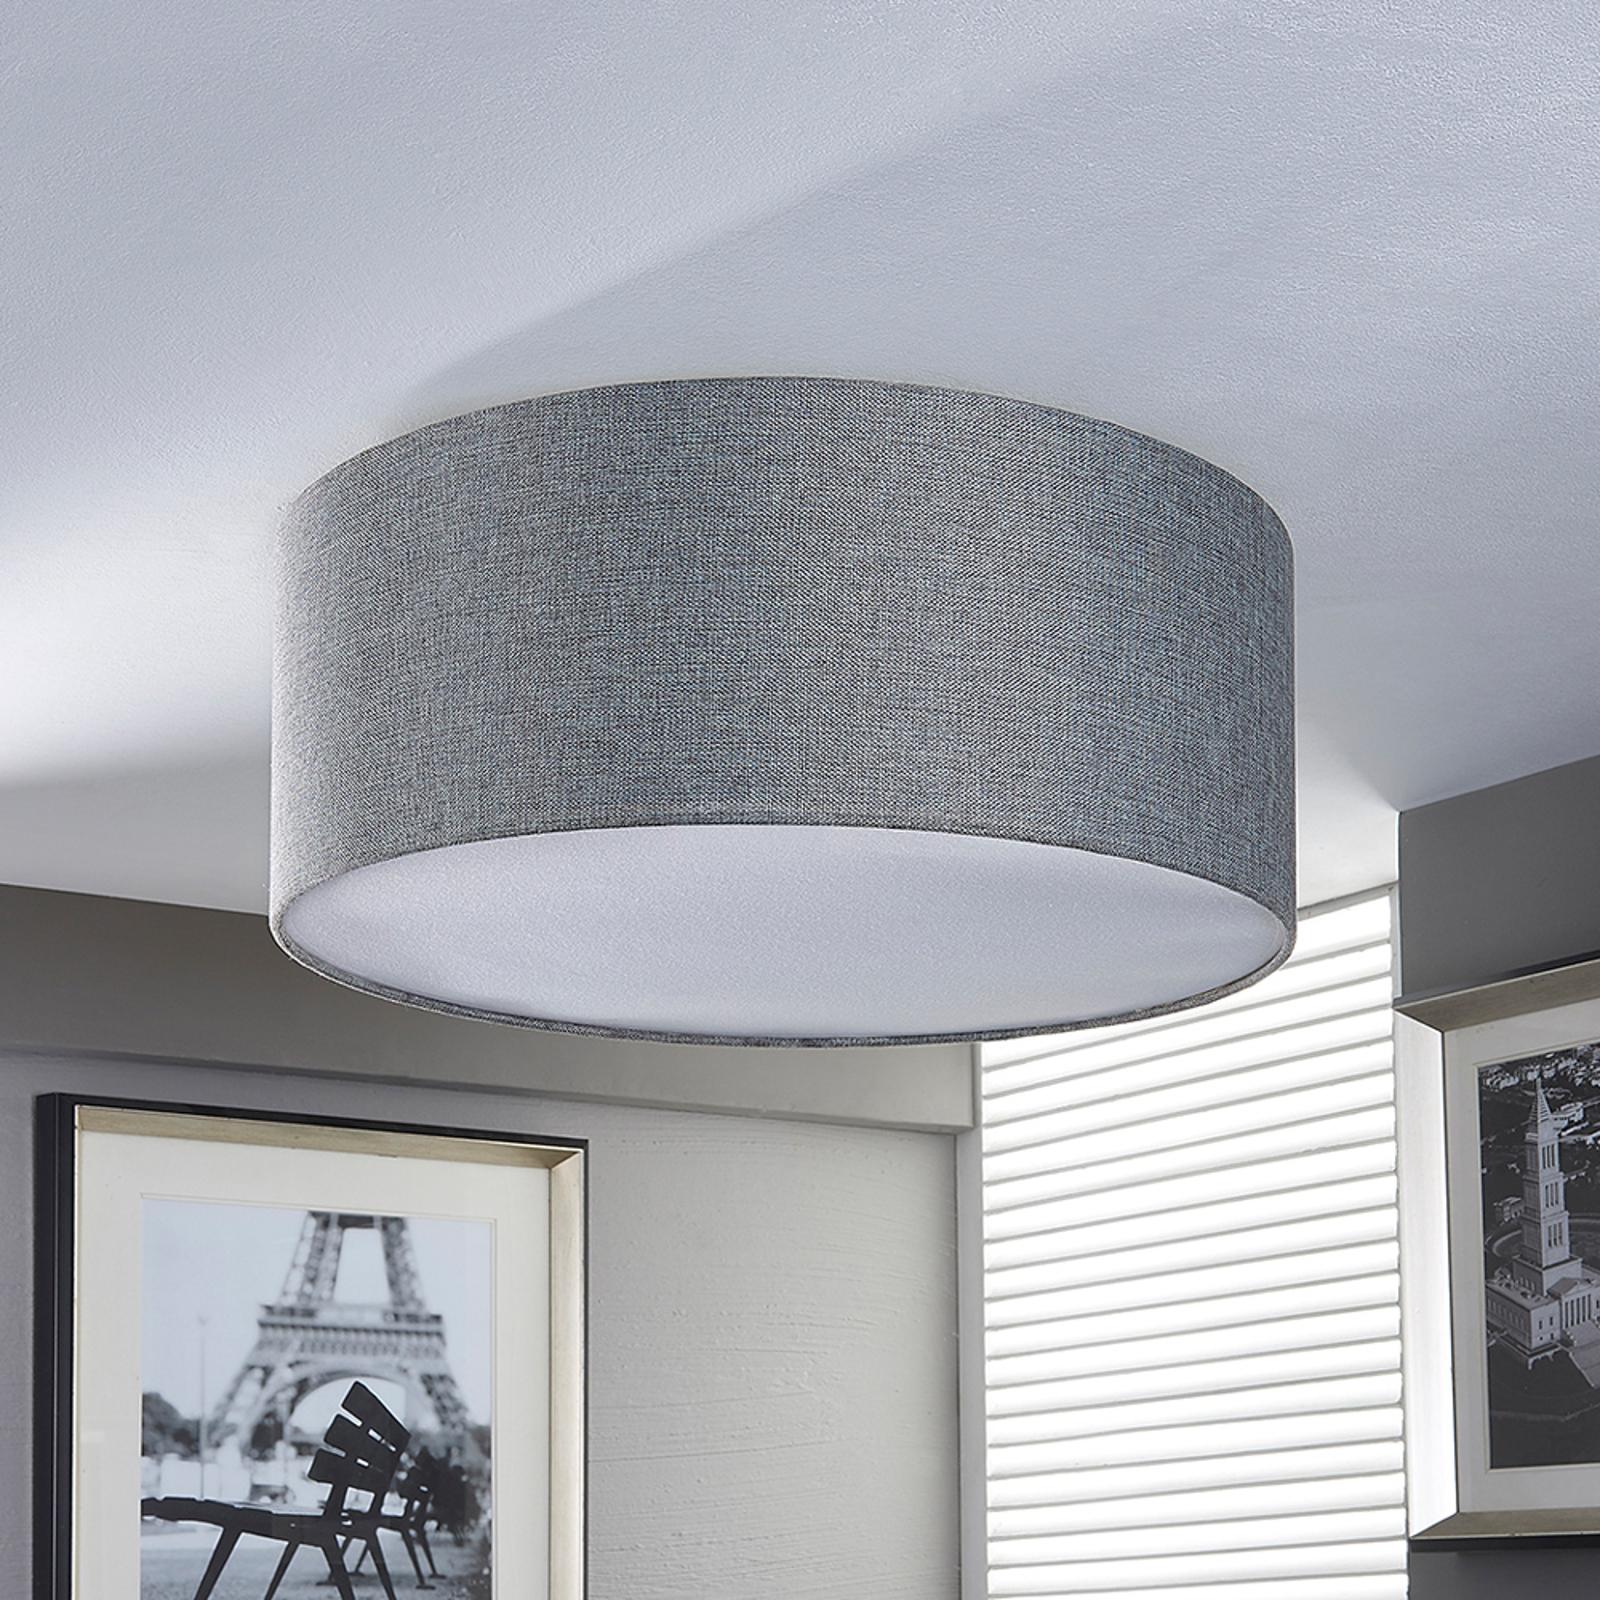 Srebrnoszara lampa sufitowa PITTA z materiału